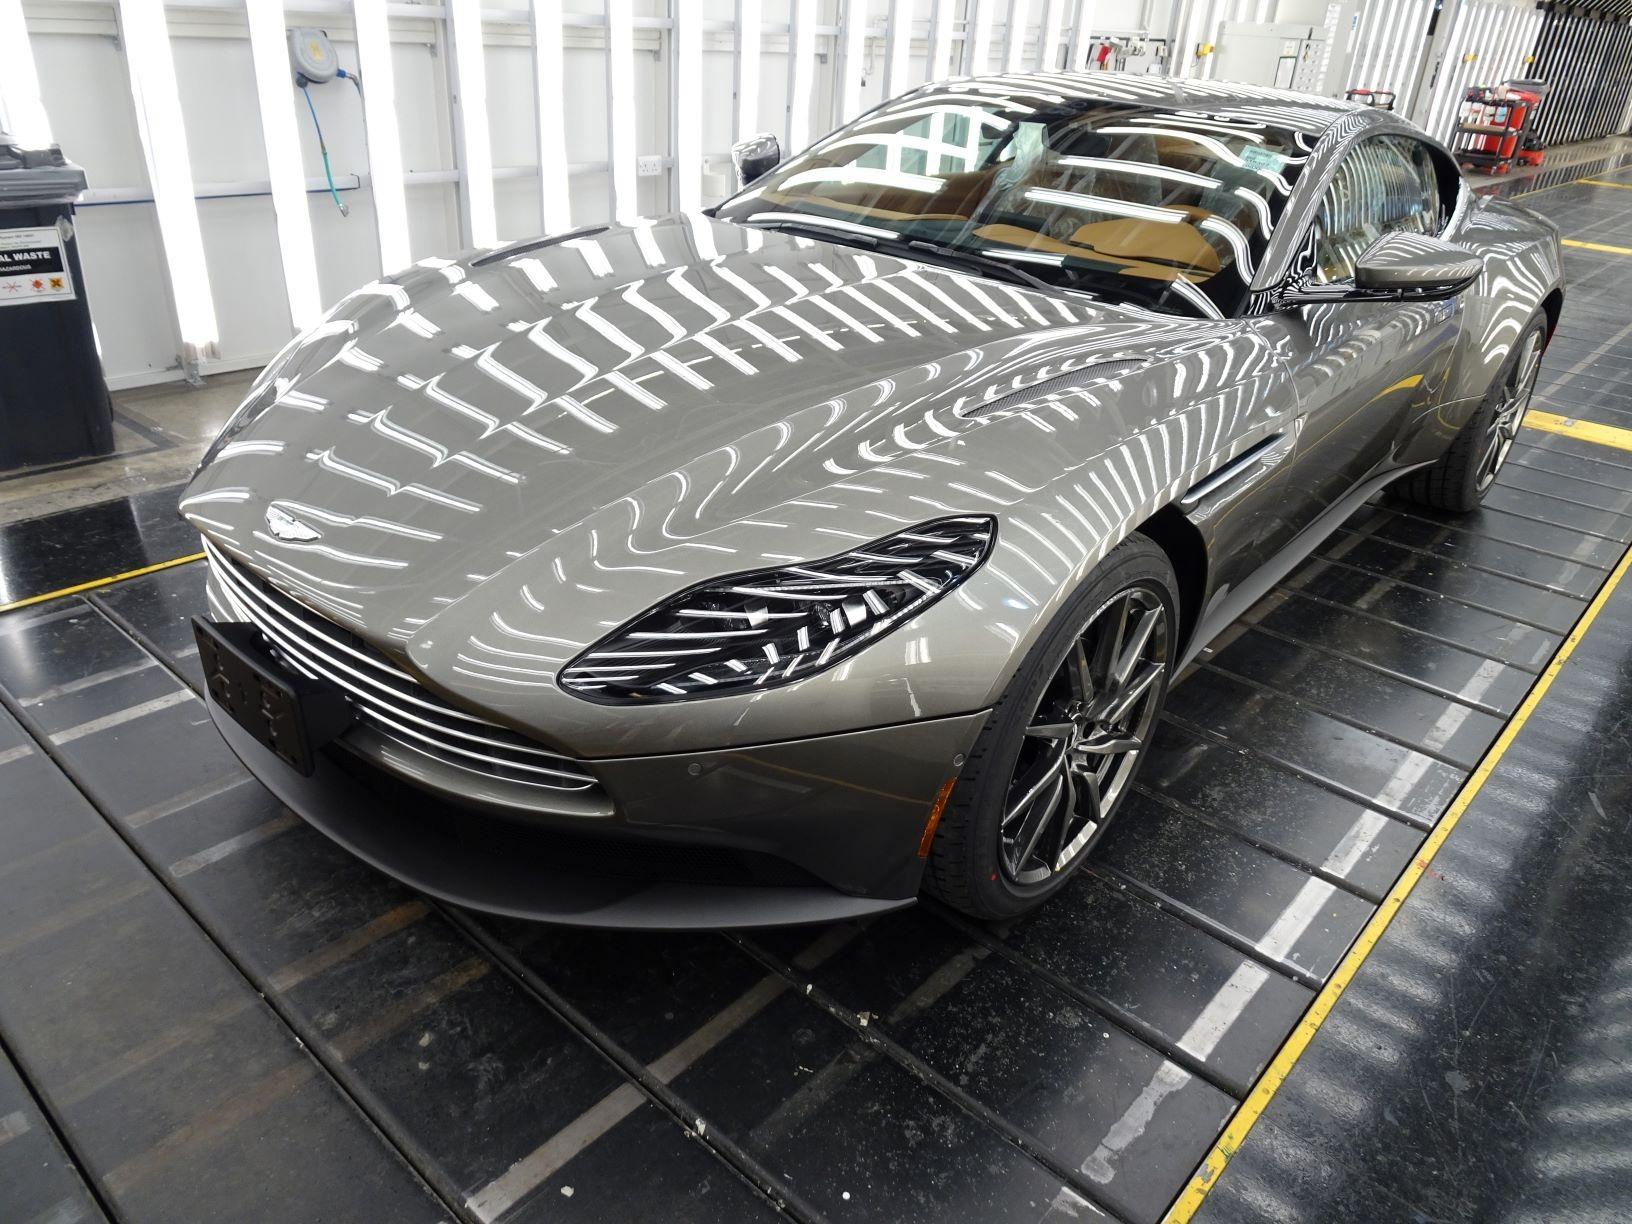 New 2021 Aston Martin DB11 V8 for sale $240,886 at Alfa Romeo of Westport in Westport CT 06880 1